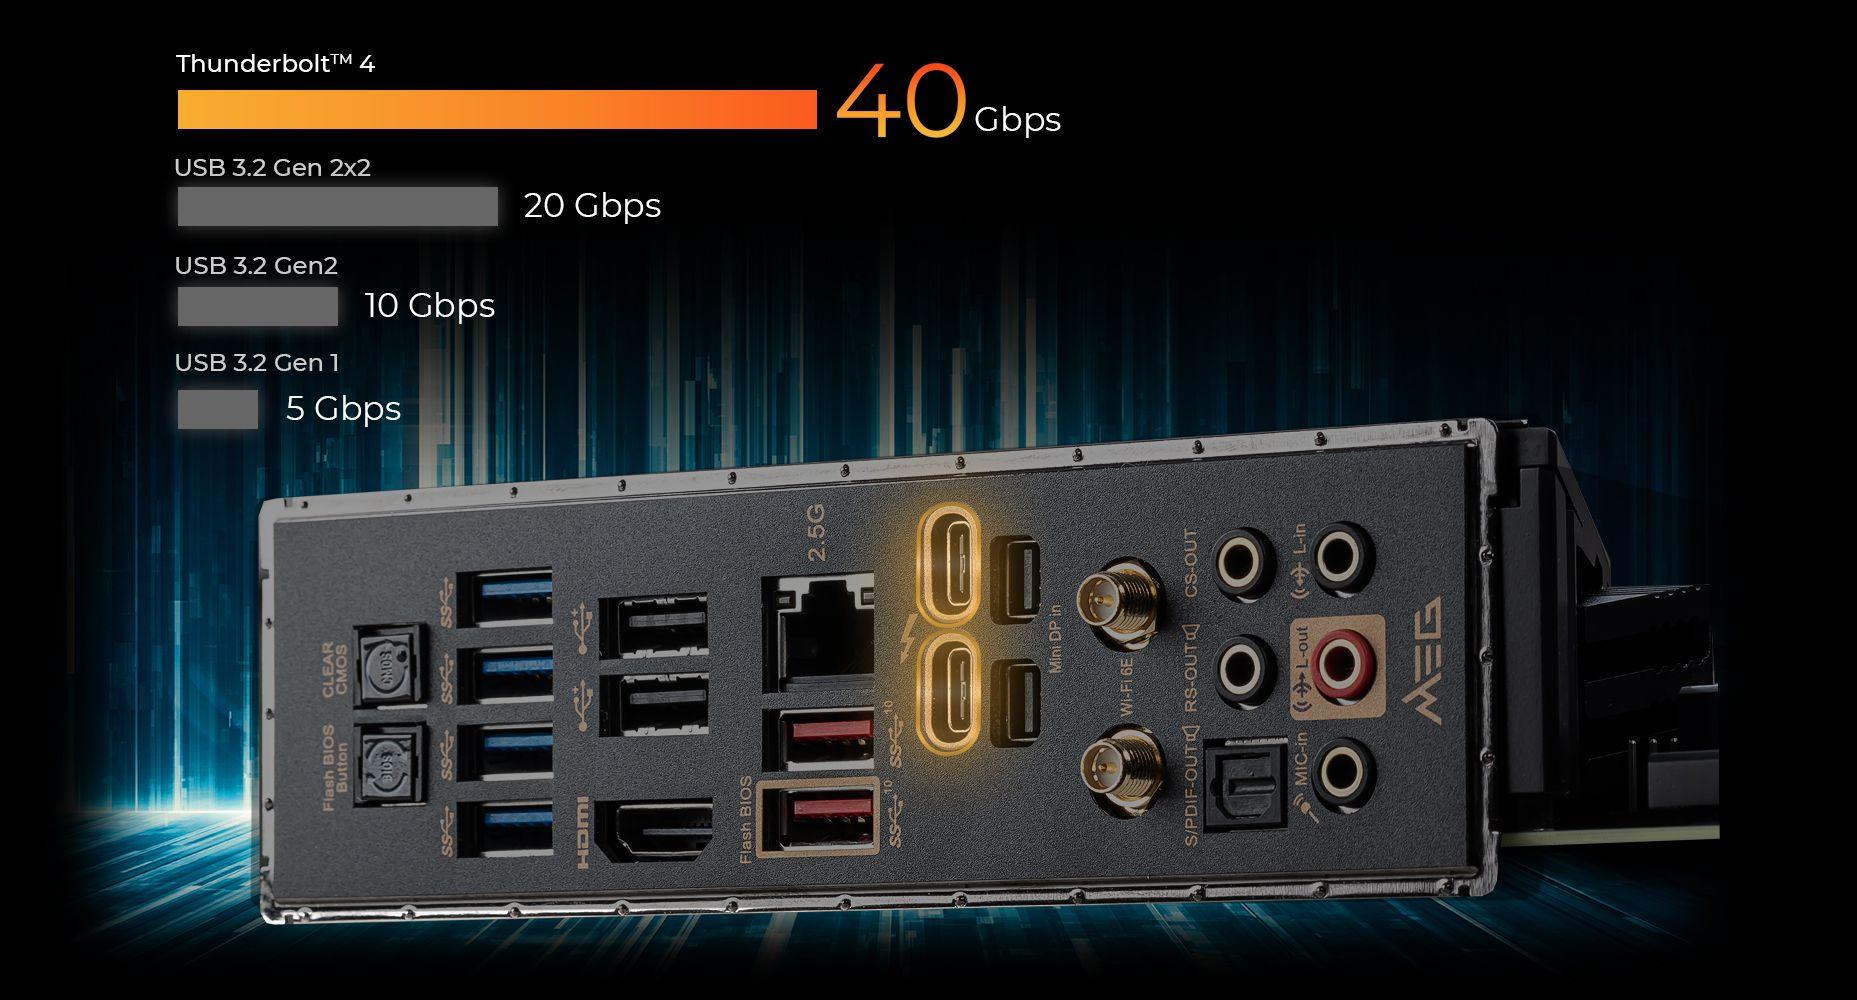 MSI MEG Z590 ACE ONBOARD THUNDERBOLT™ 4 PORTS